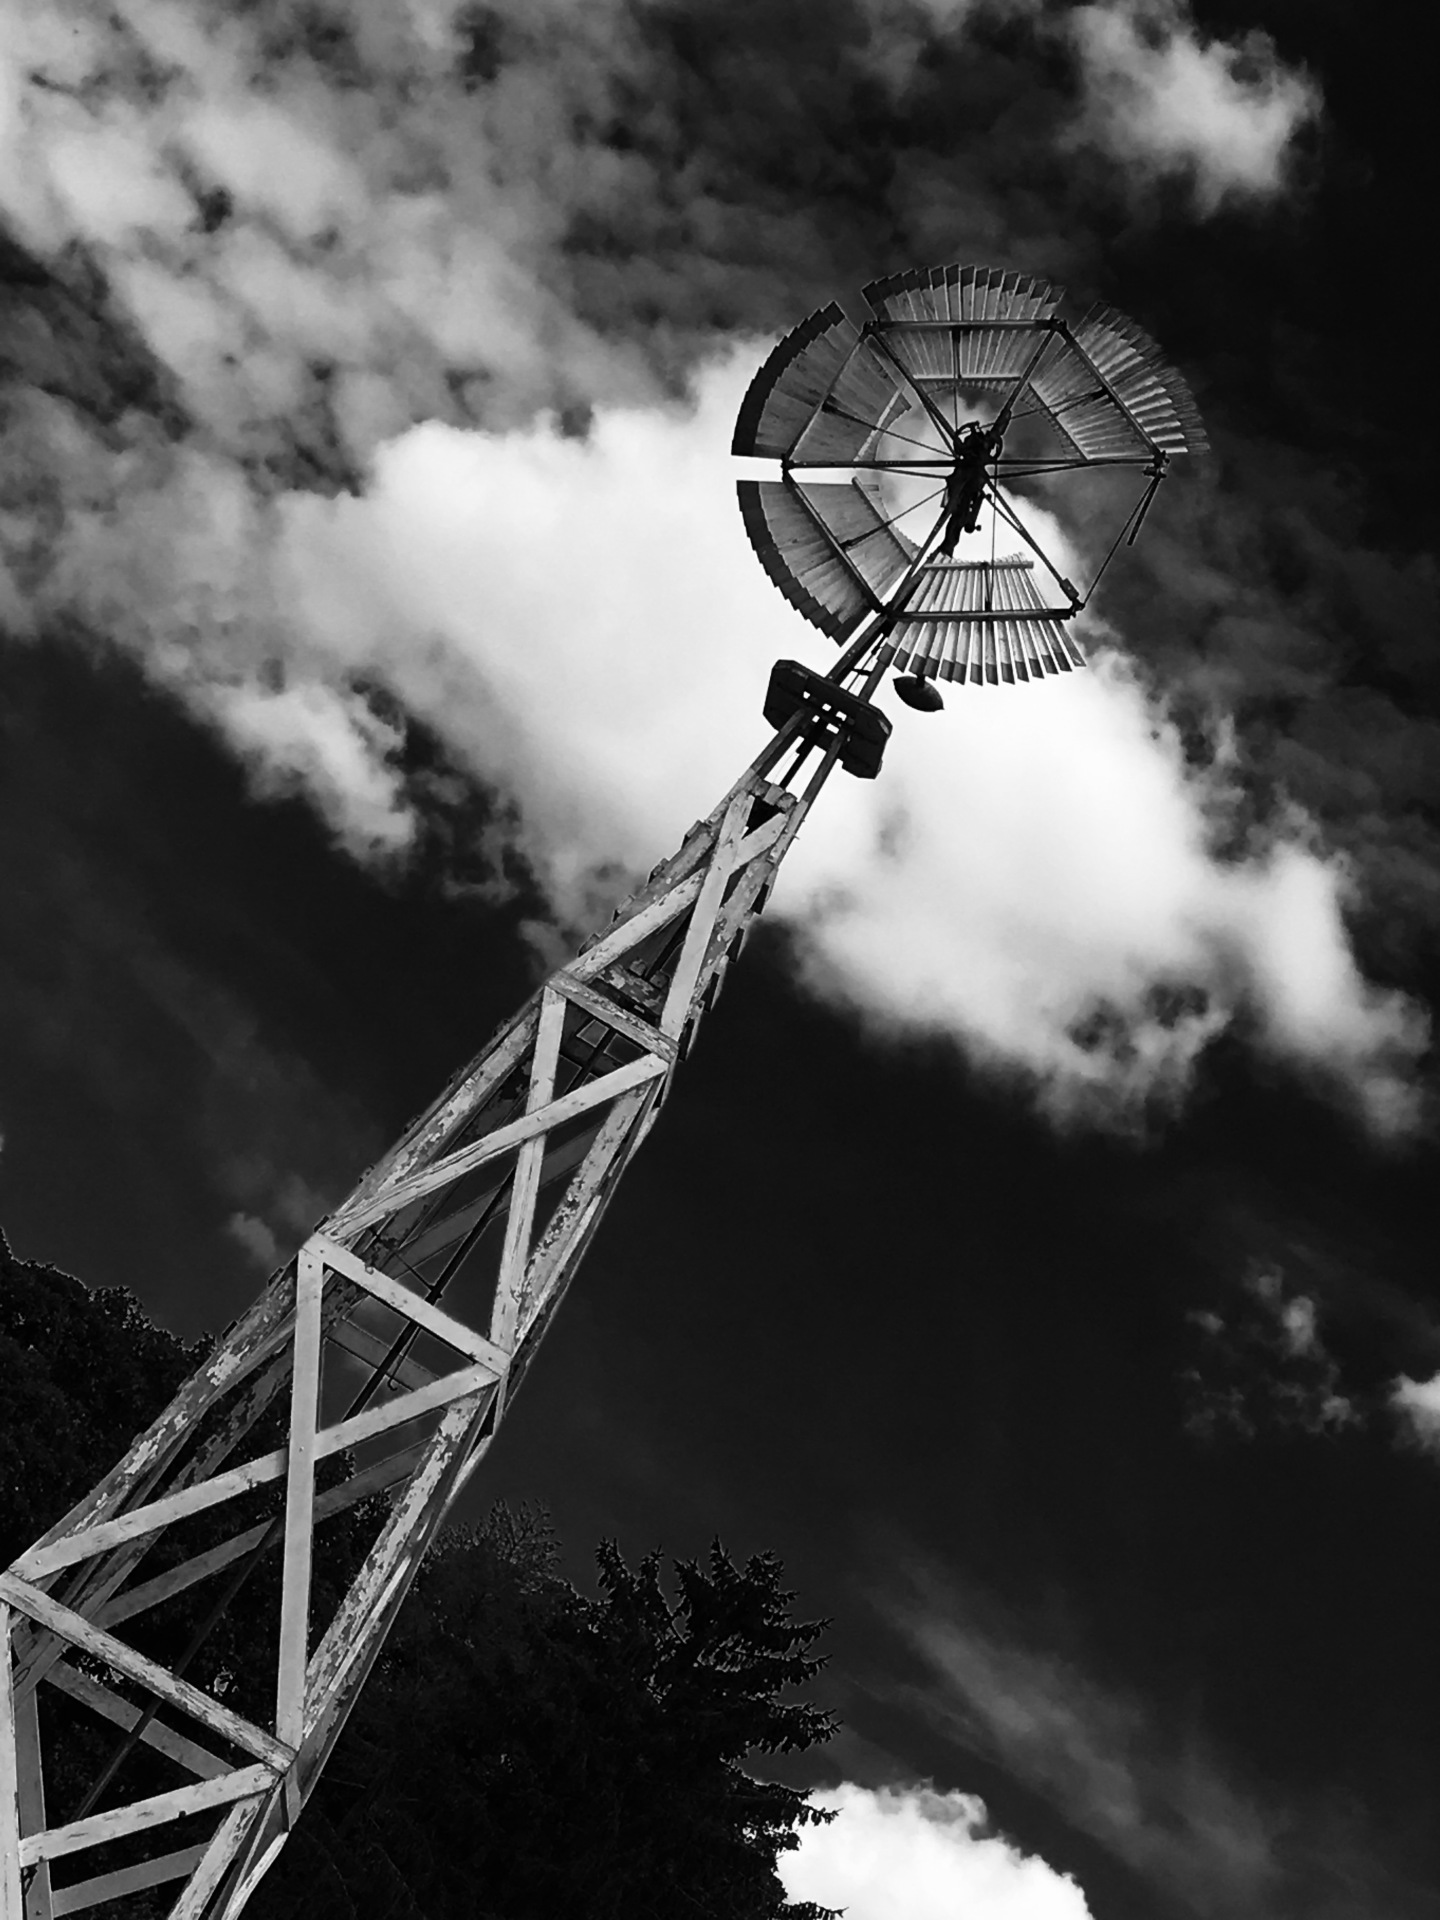 Winds of Change, Digital Still-Life Photography by Artist Mindy Lichter. MLICHTER fINE ART dESIGN